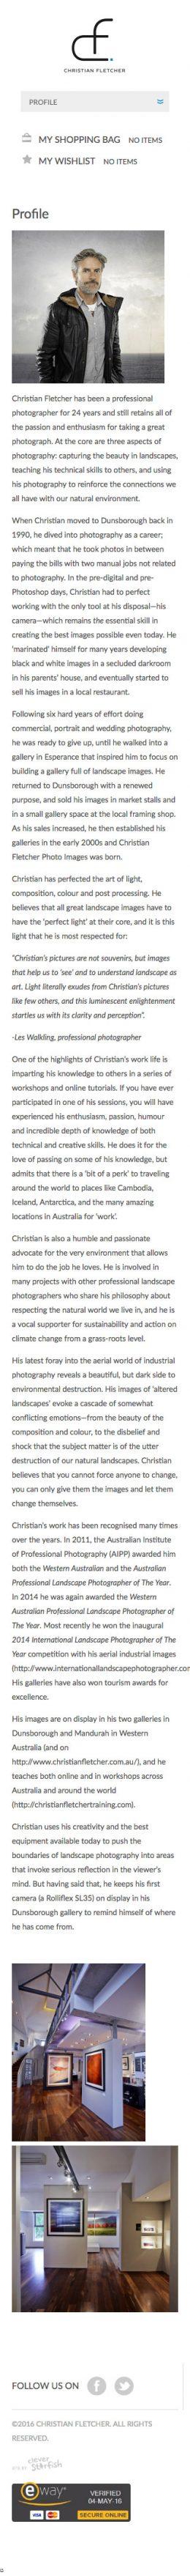 Christian Fletcher Online Profile - Mobile